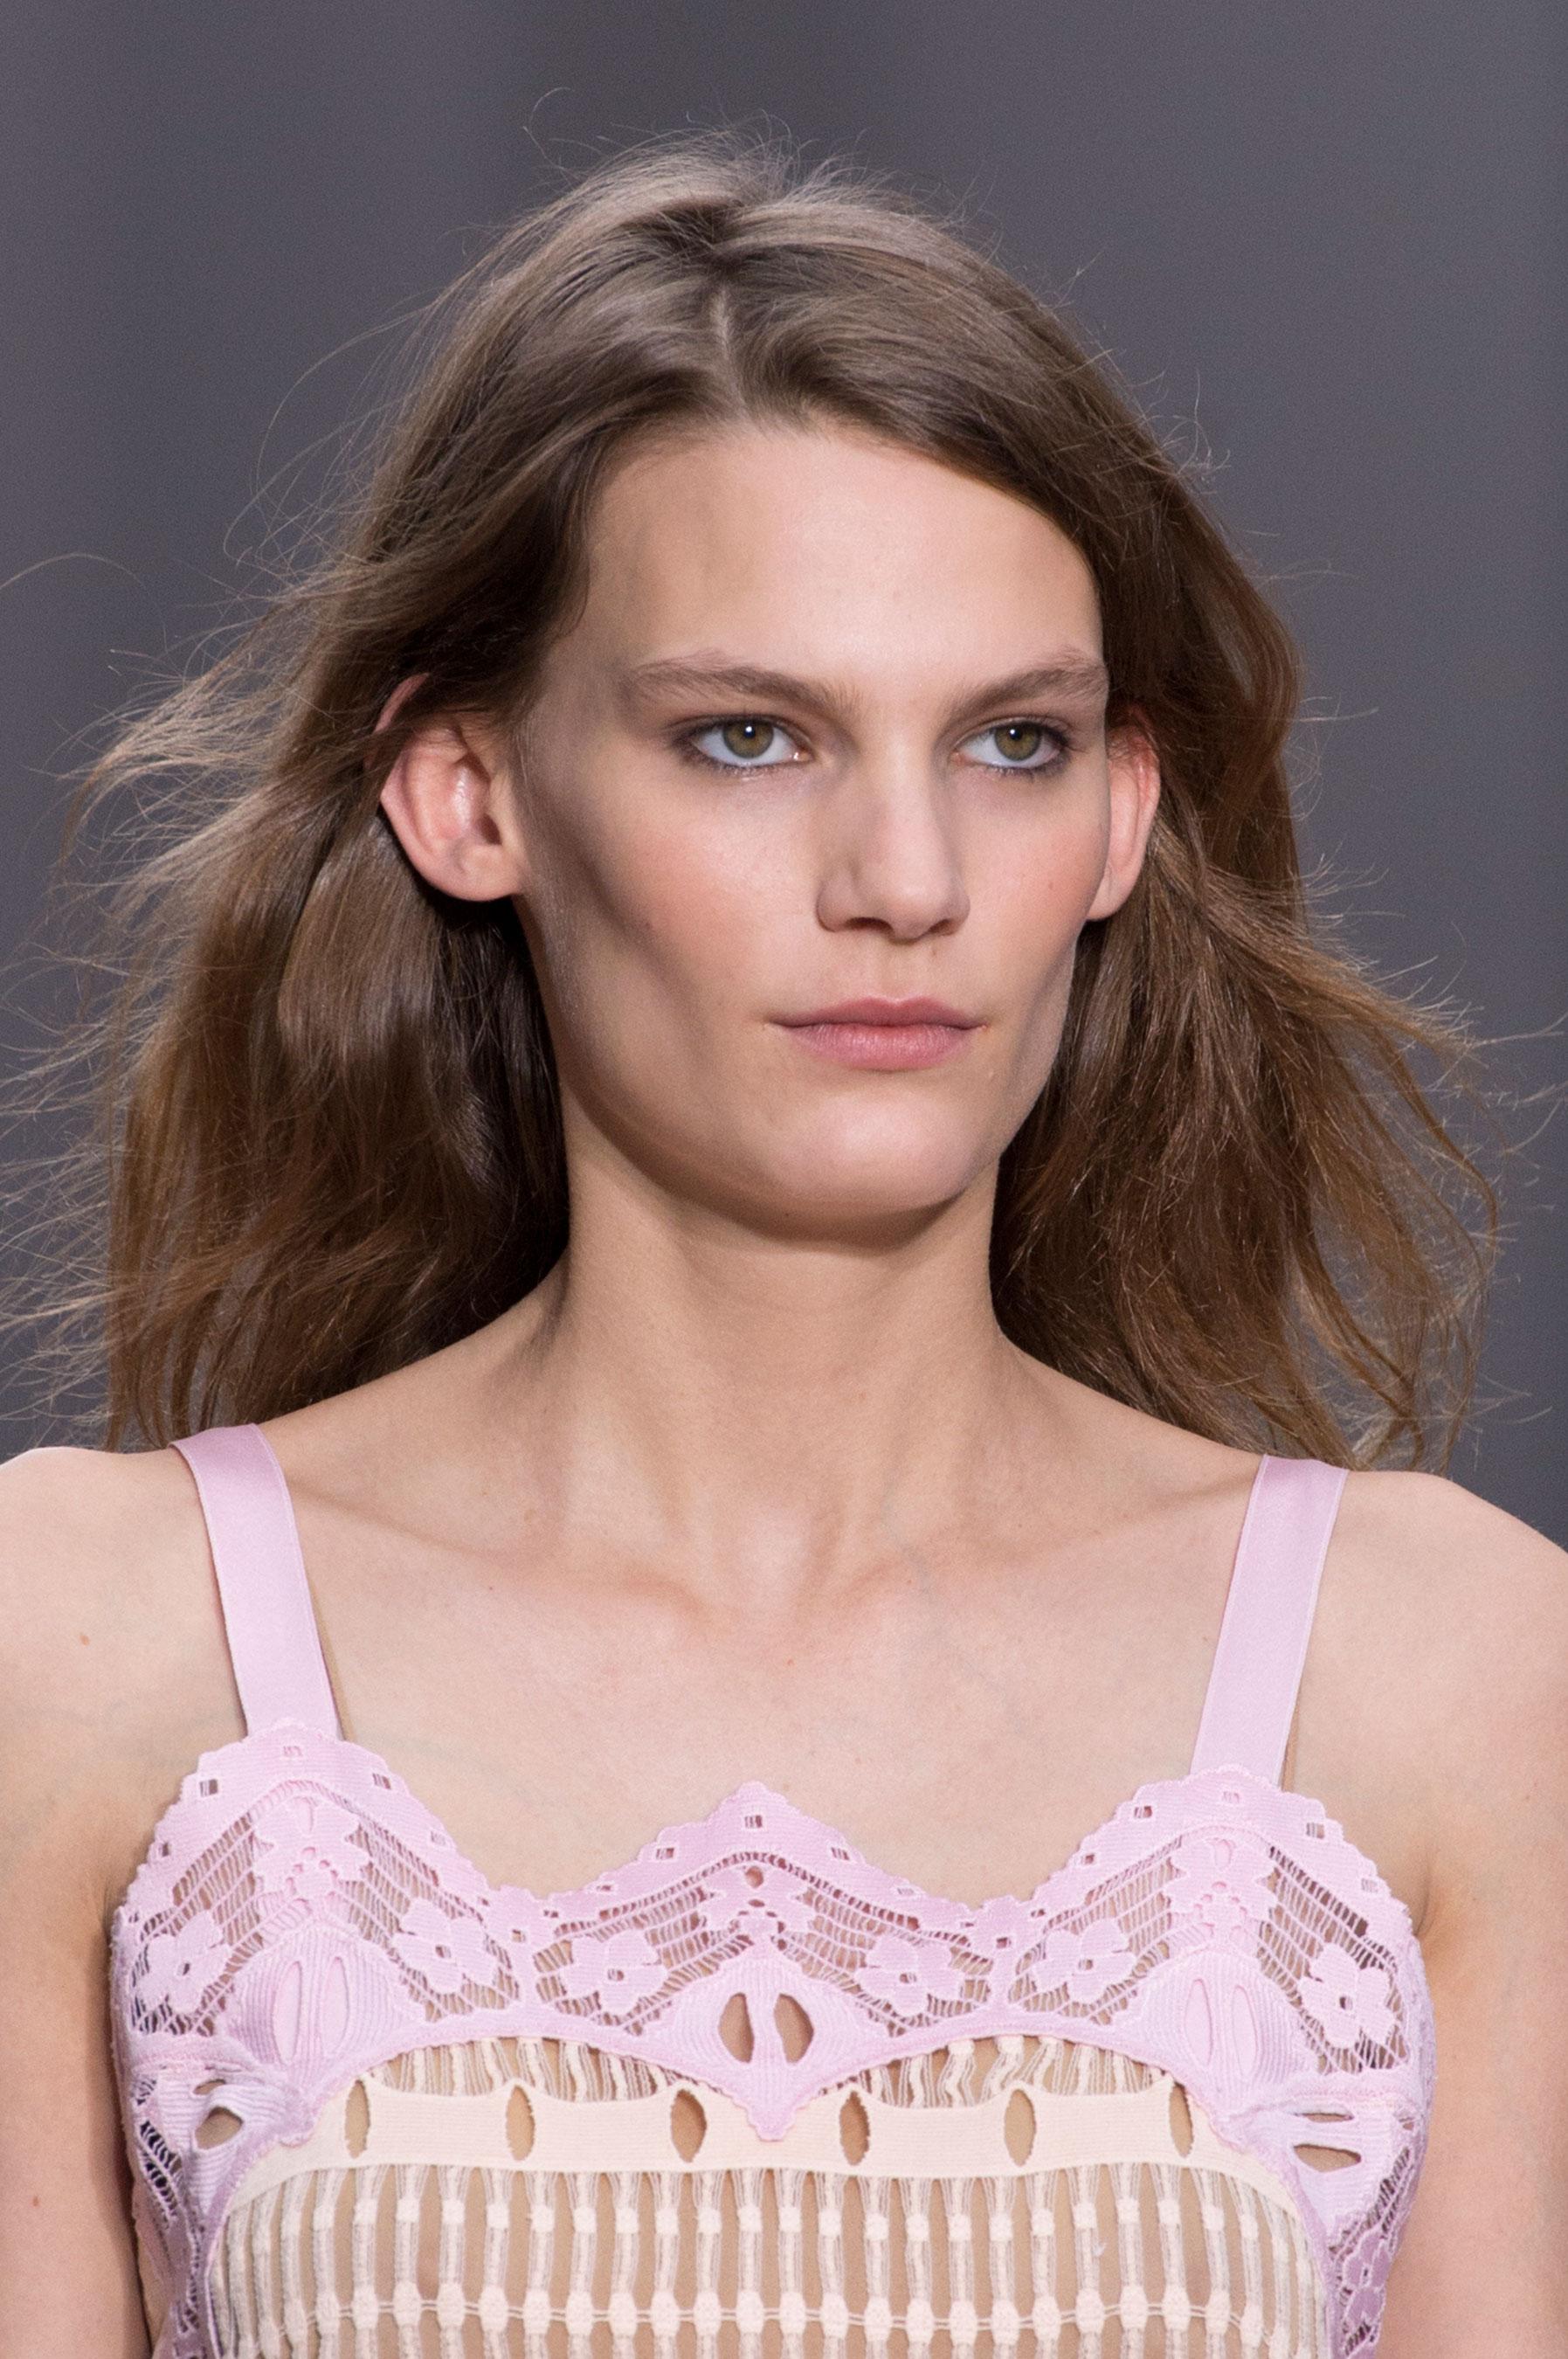 Chloe-spring-2016-runway-beauty-fashion-show-the-impression-12